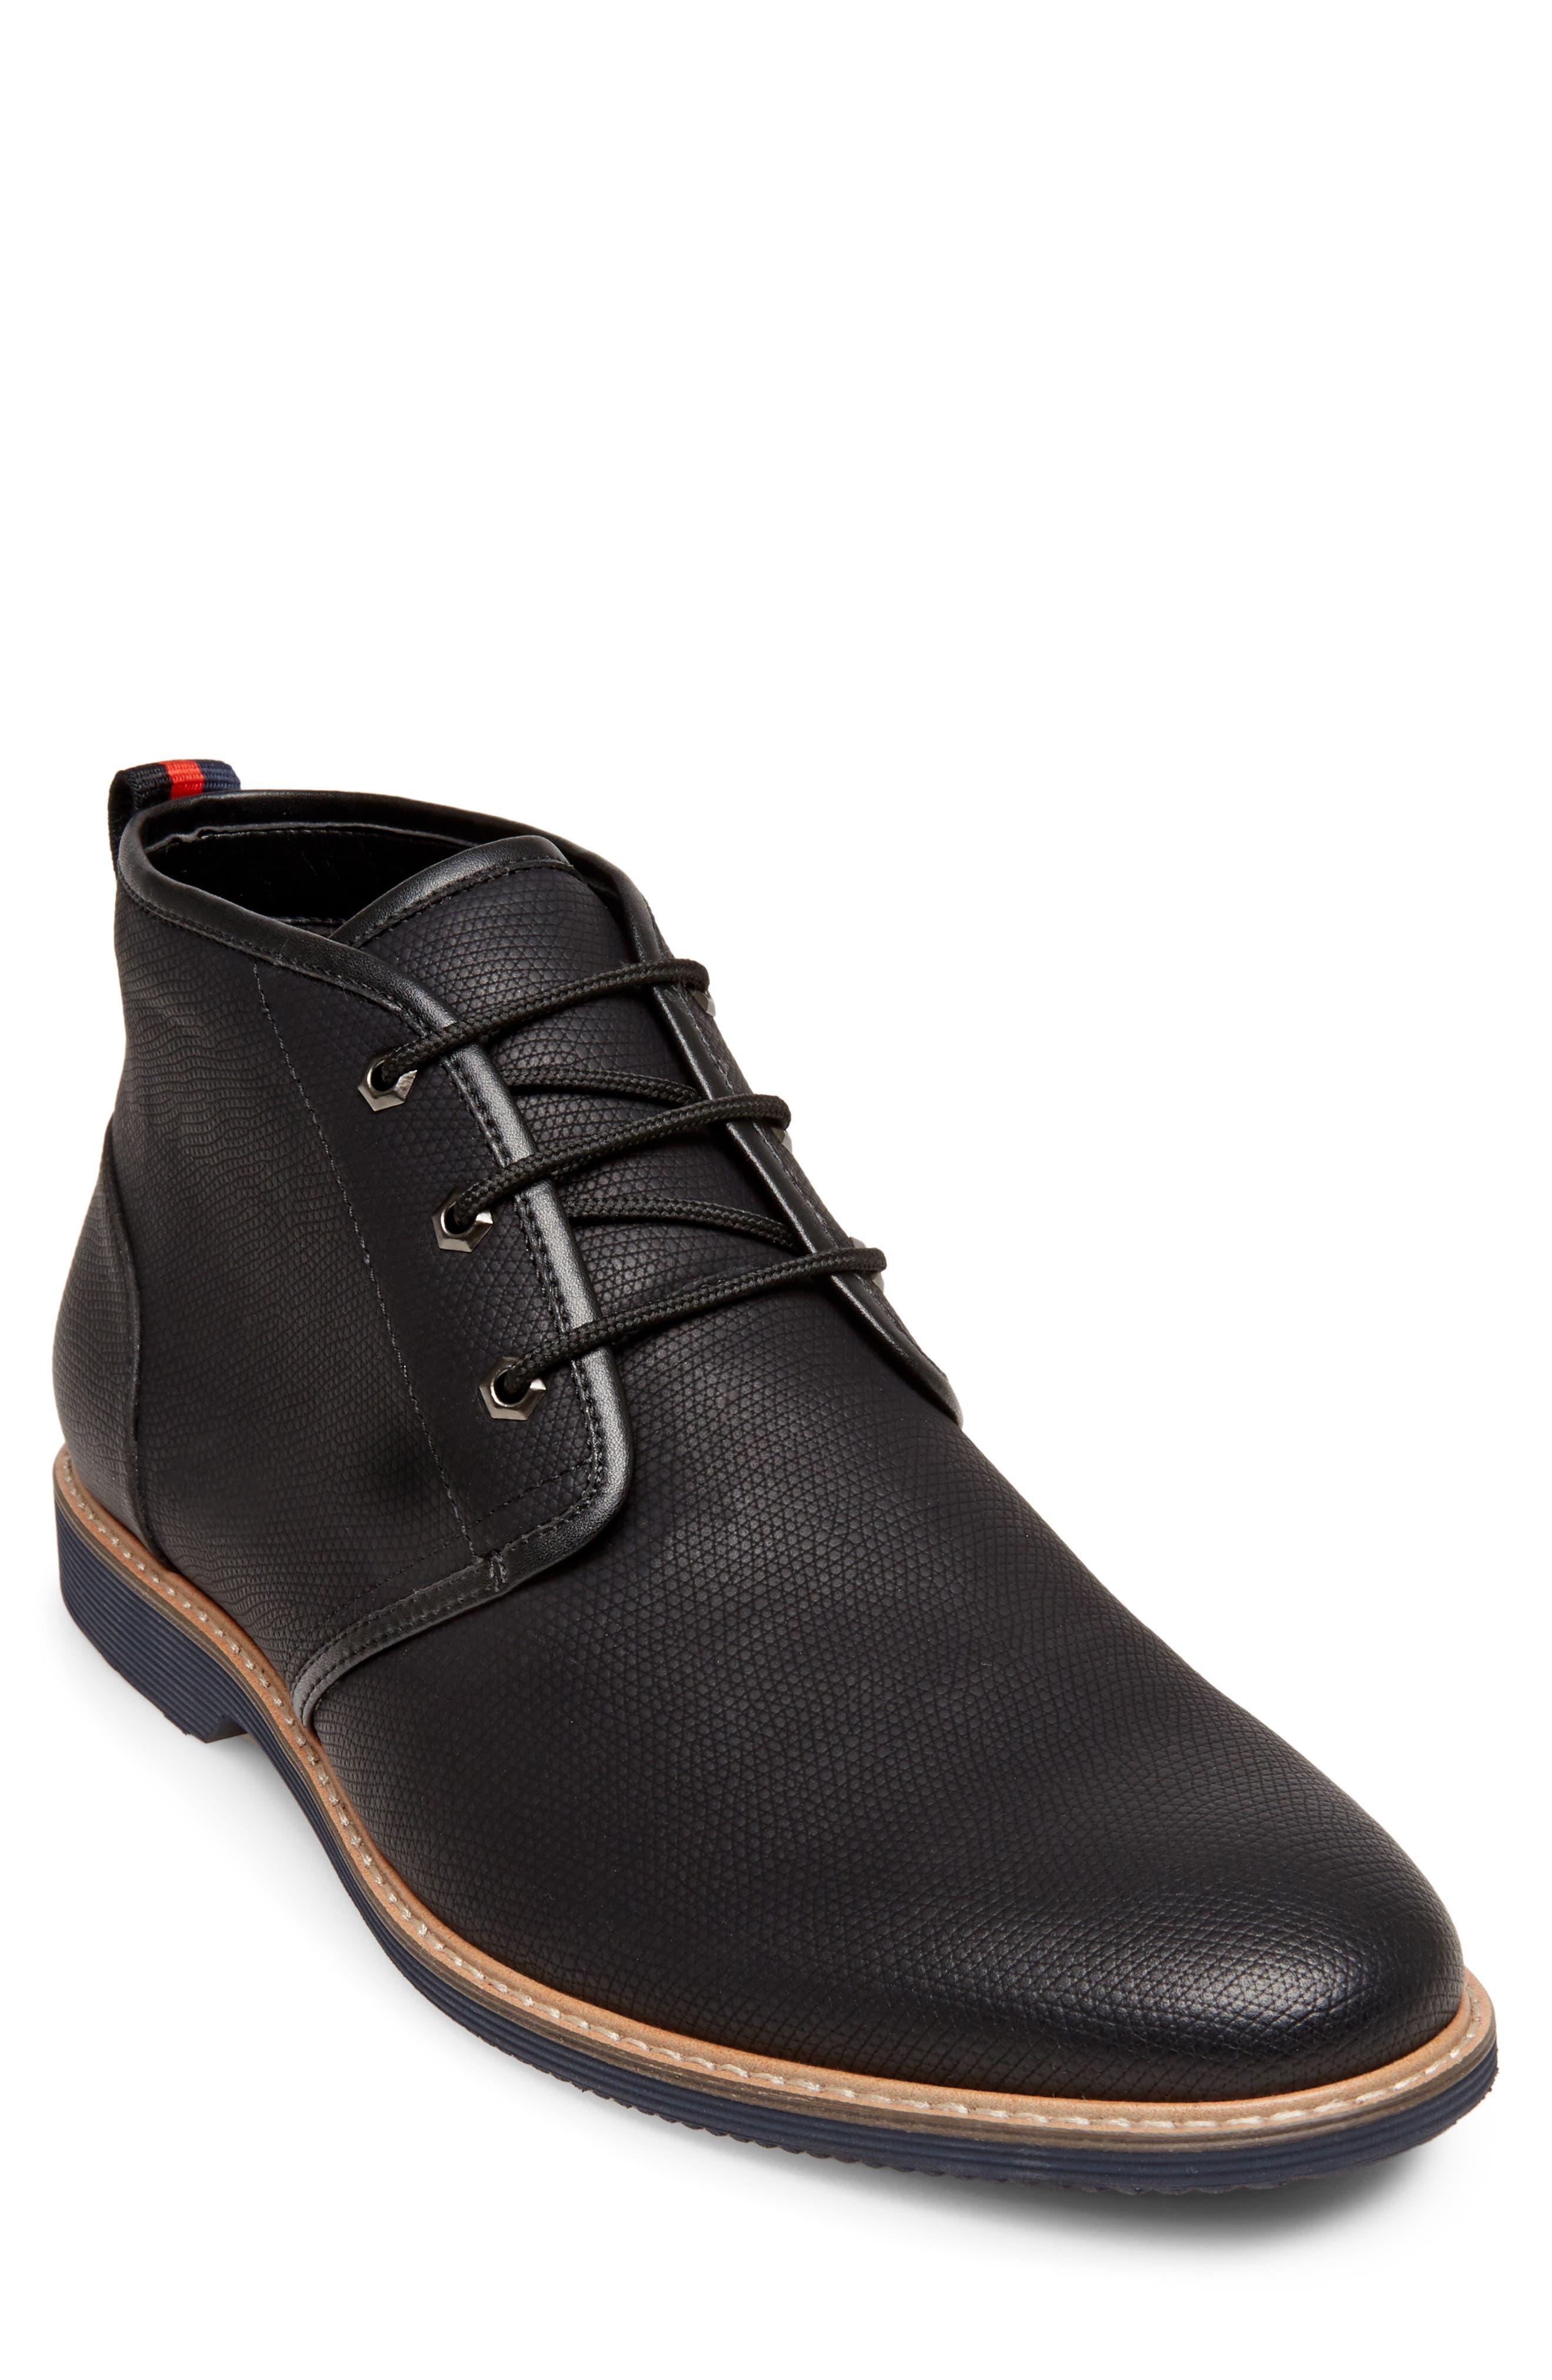 STEVE MADDEN, Nurture Plain Toe Boot, Main thumbnail 1, color, 002